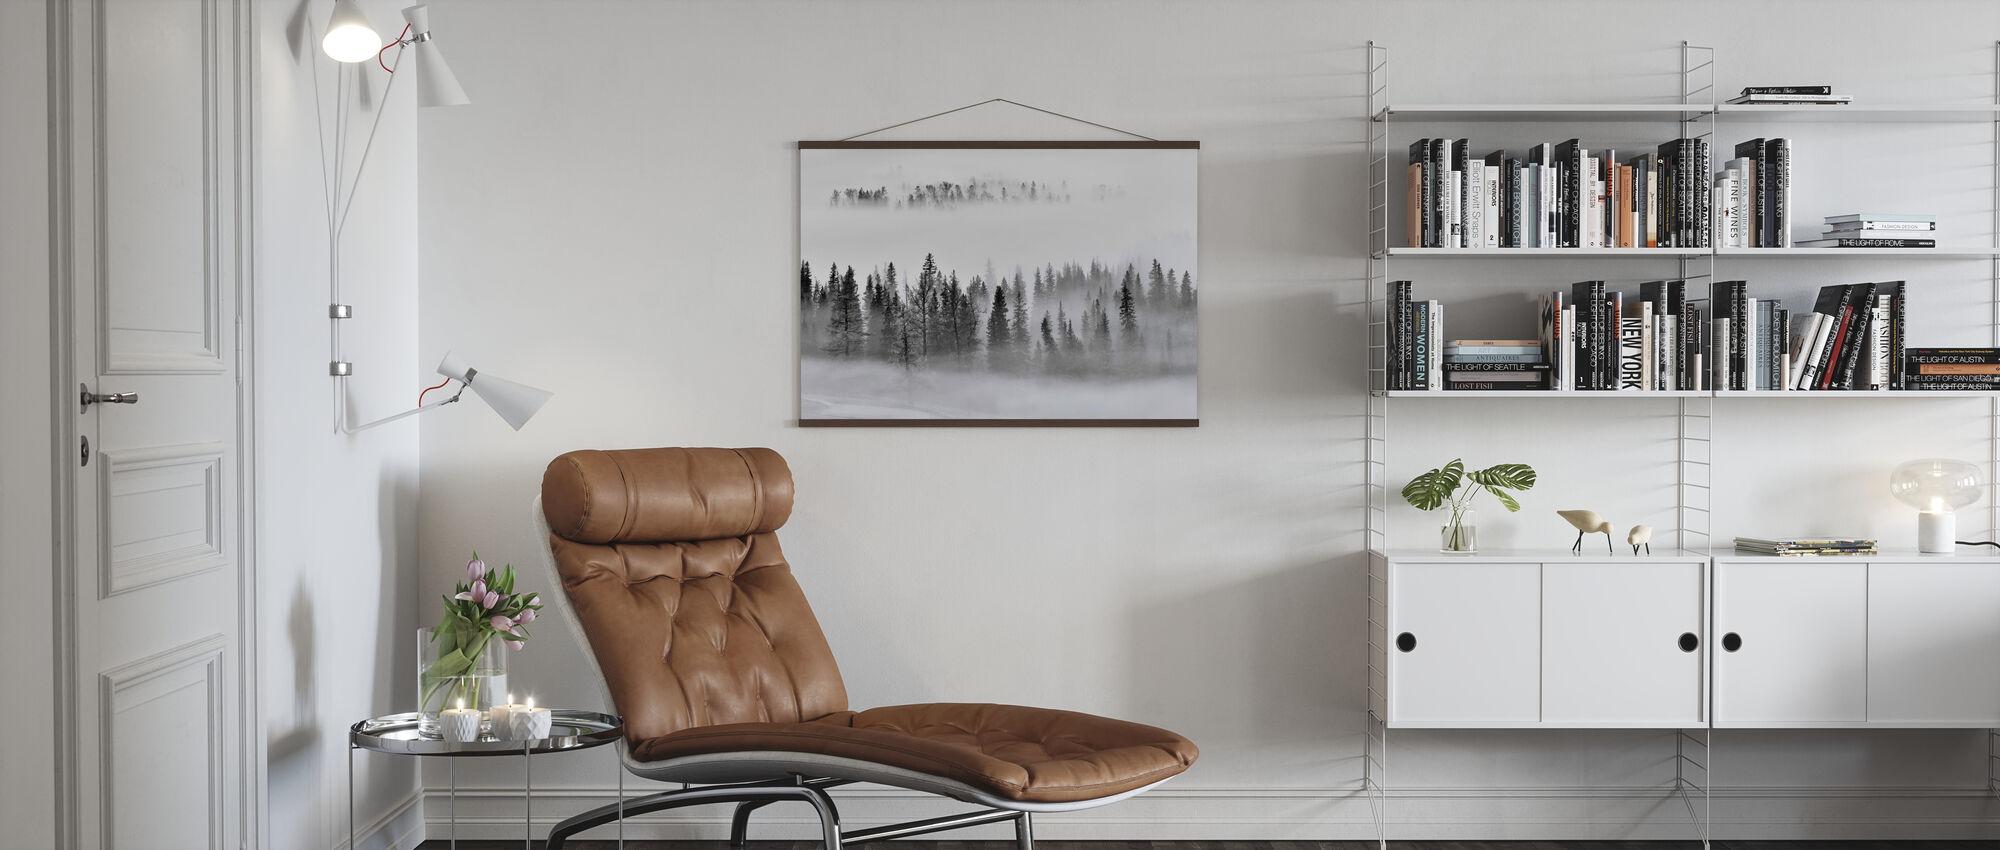 Mistig bos - Poster - Woonkamer